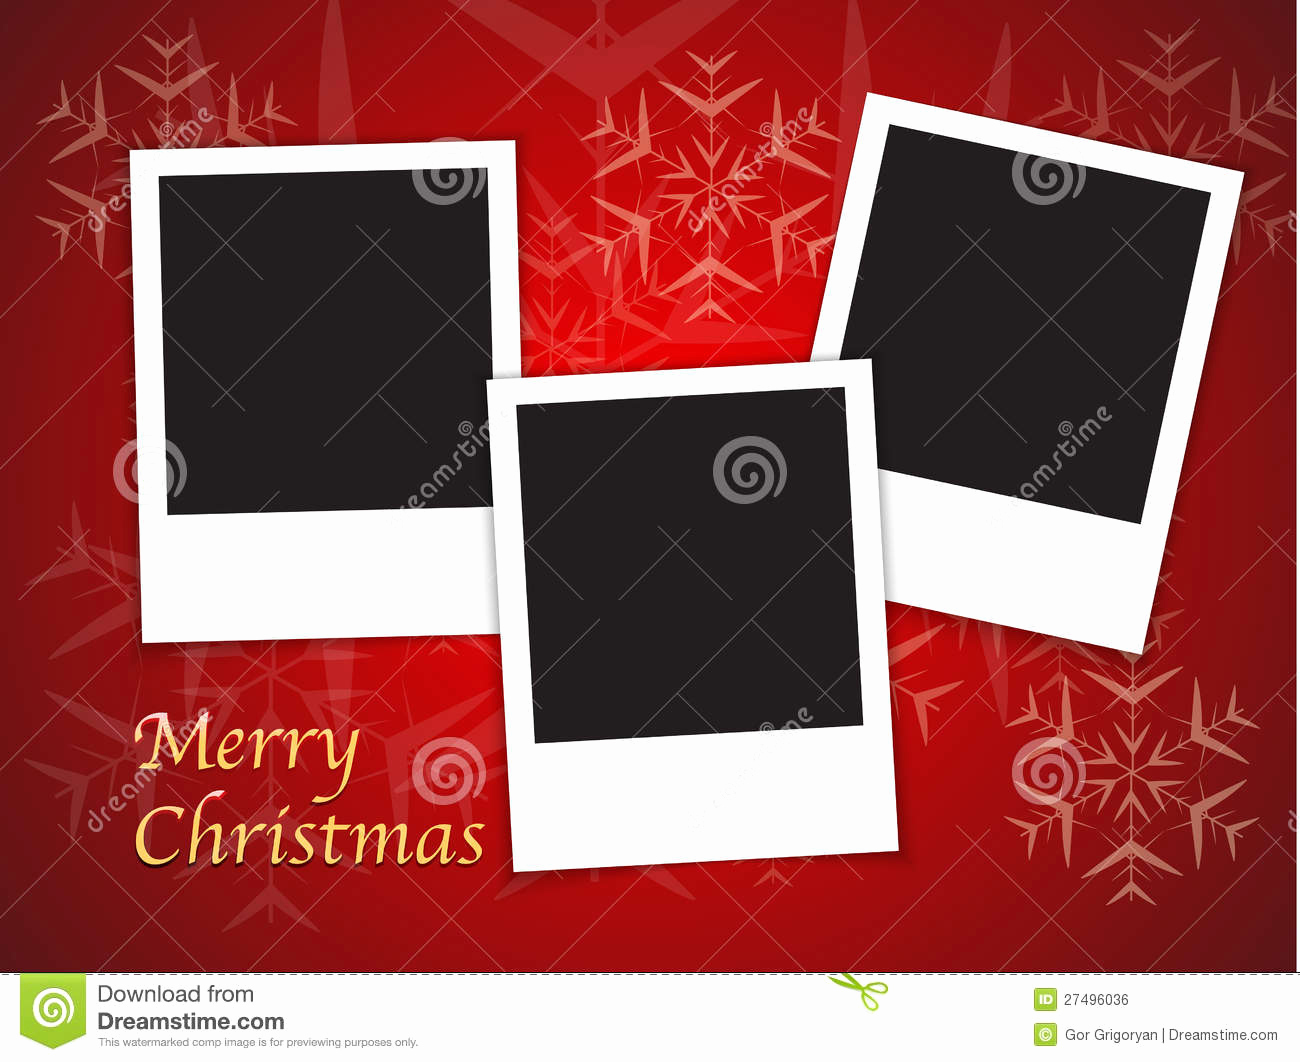 Free Photo Christmas Card Templates Beautiful Christmas Card Templates with Blank Frames Stock